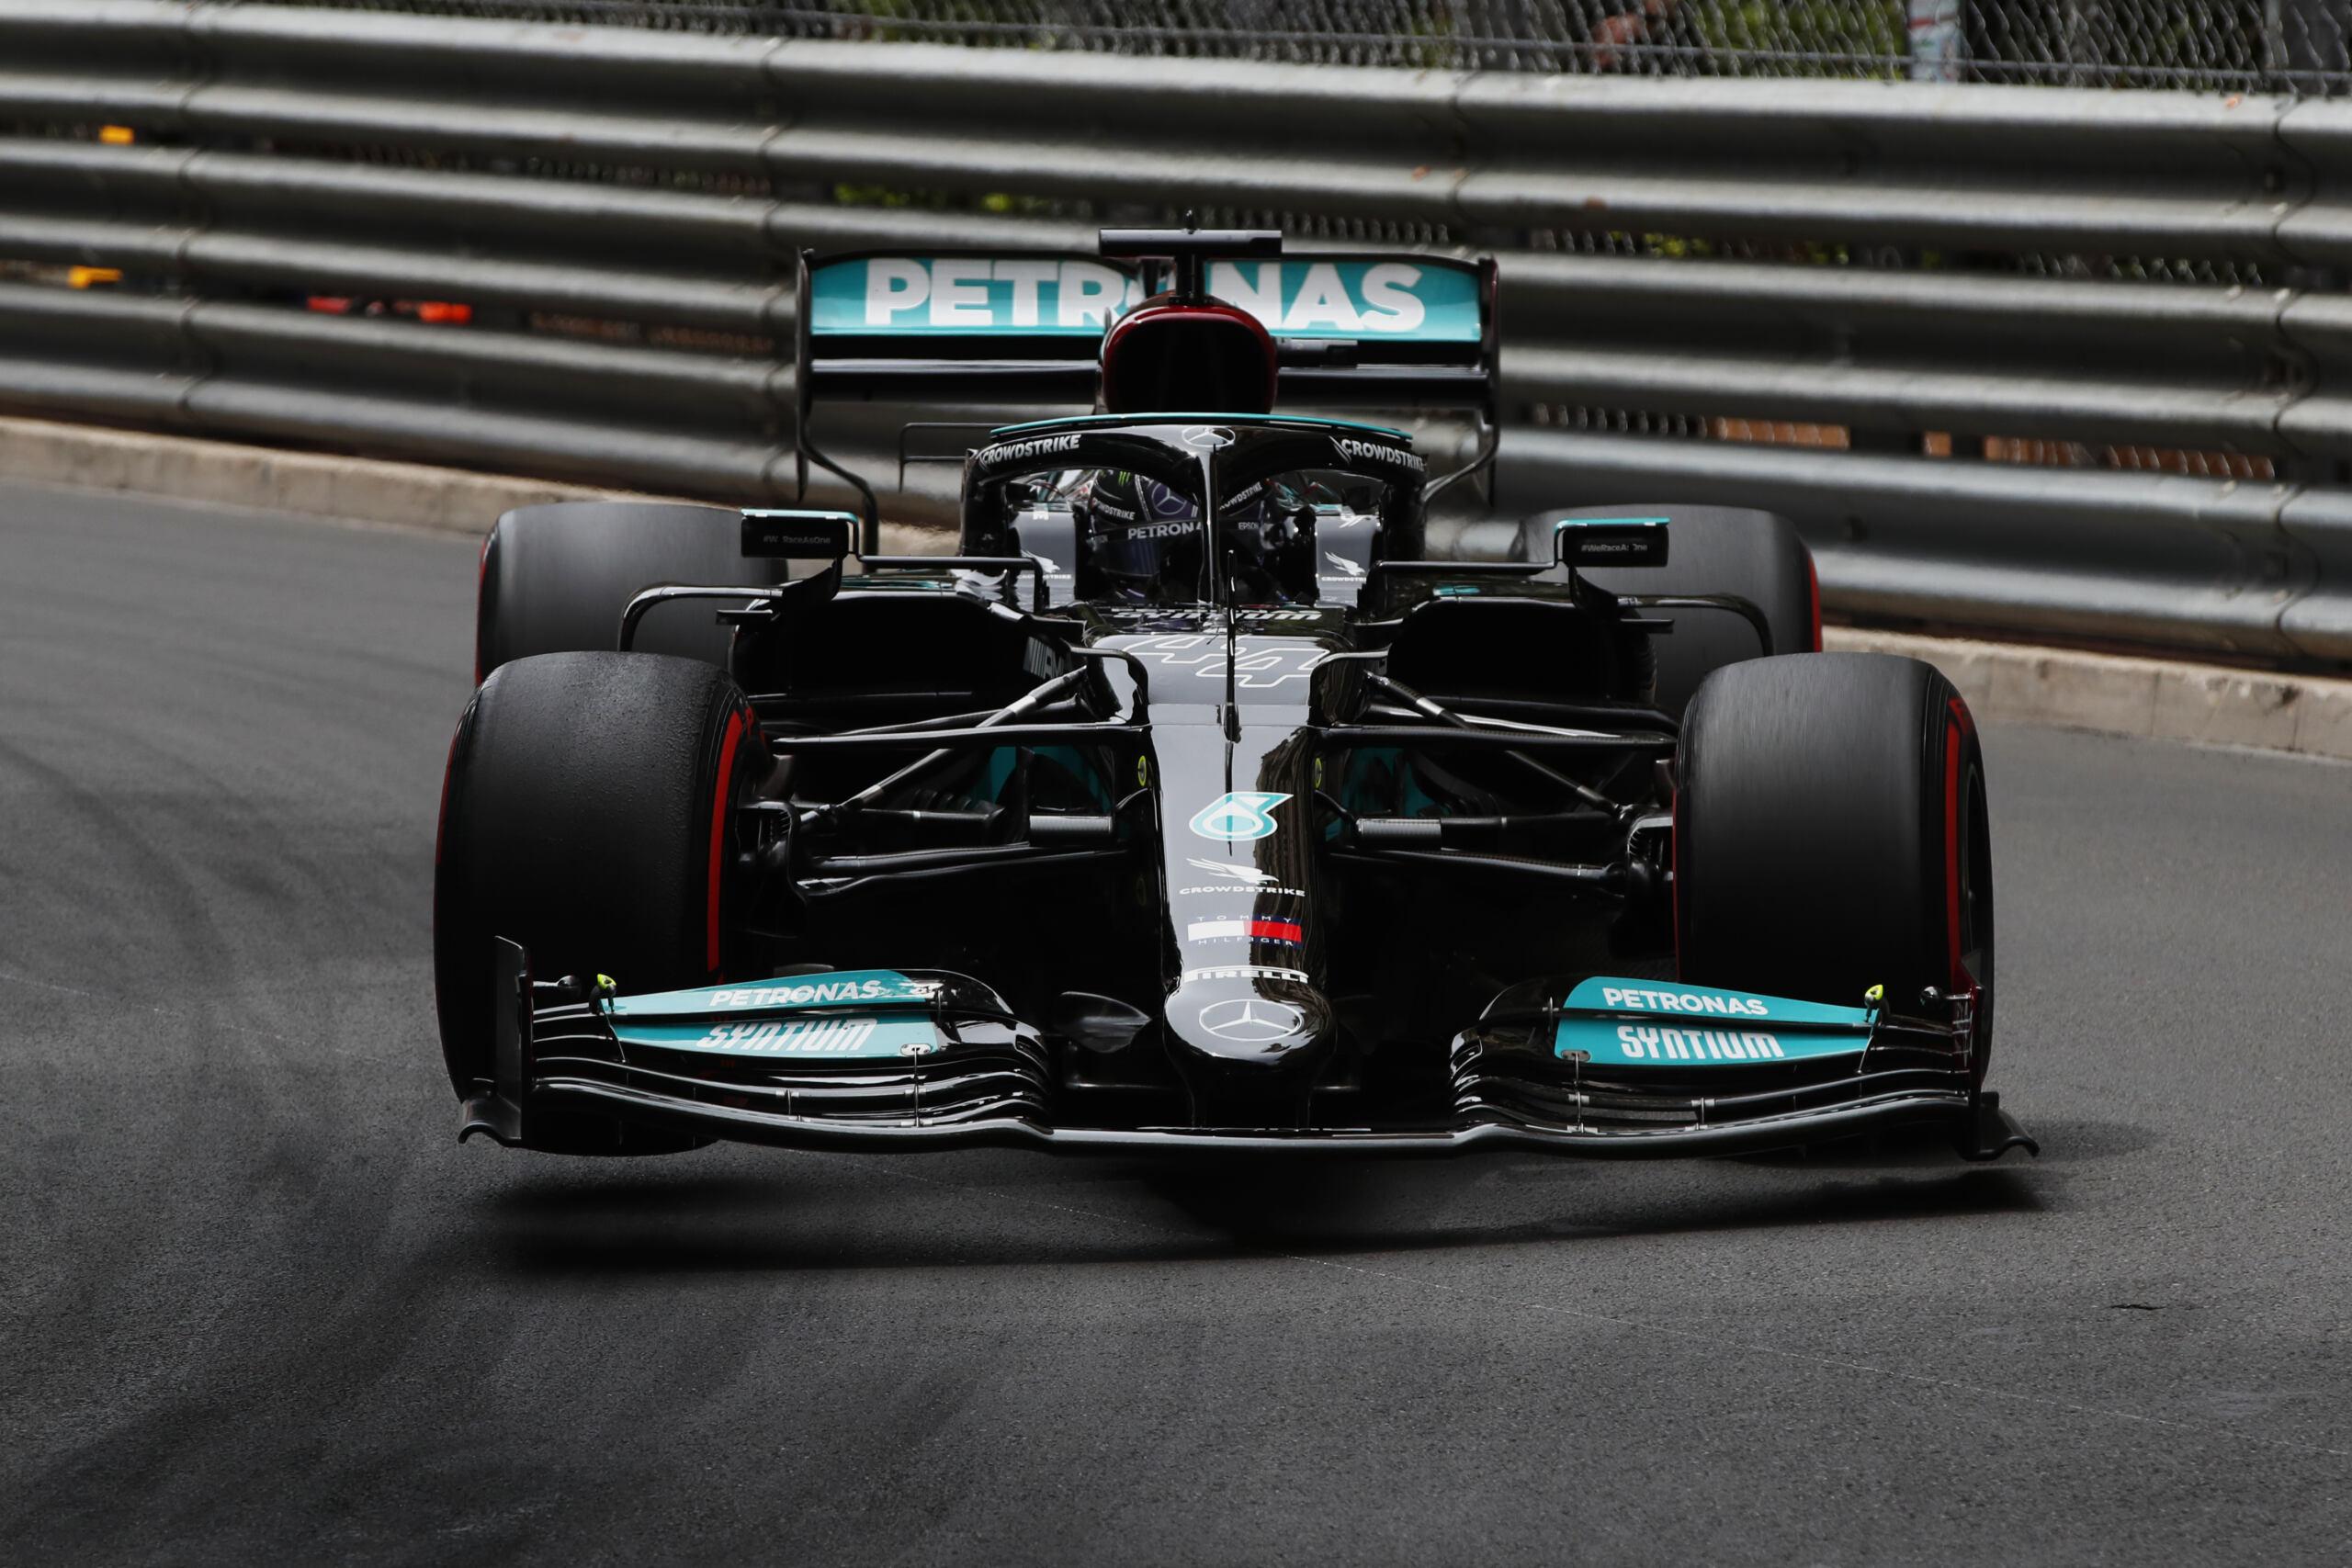 Mercedes-AMG Petronas F1 GP Azerbaigian